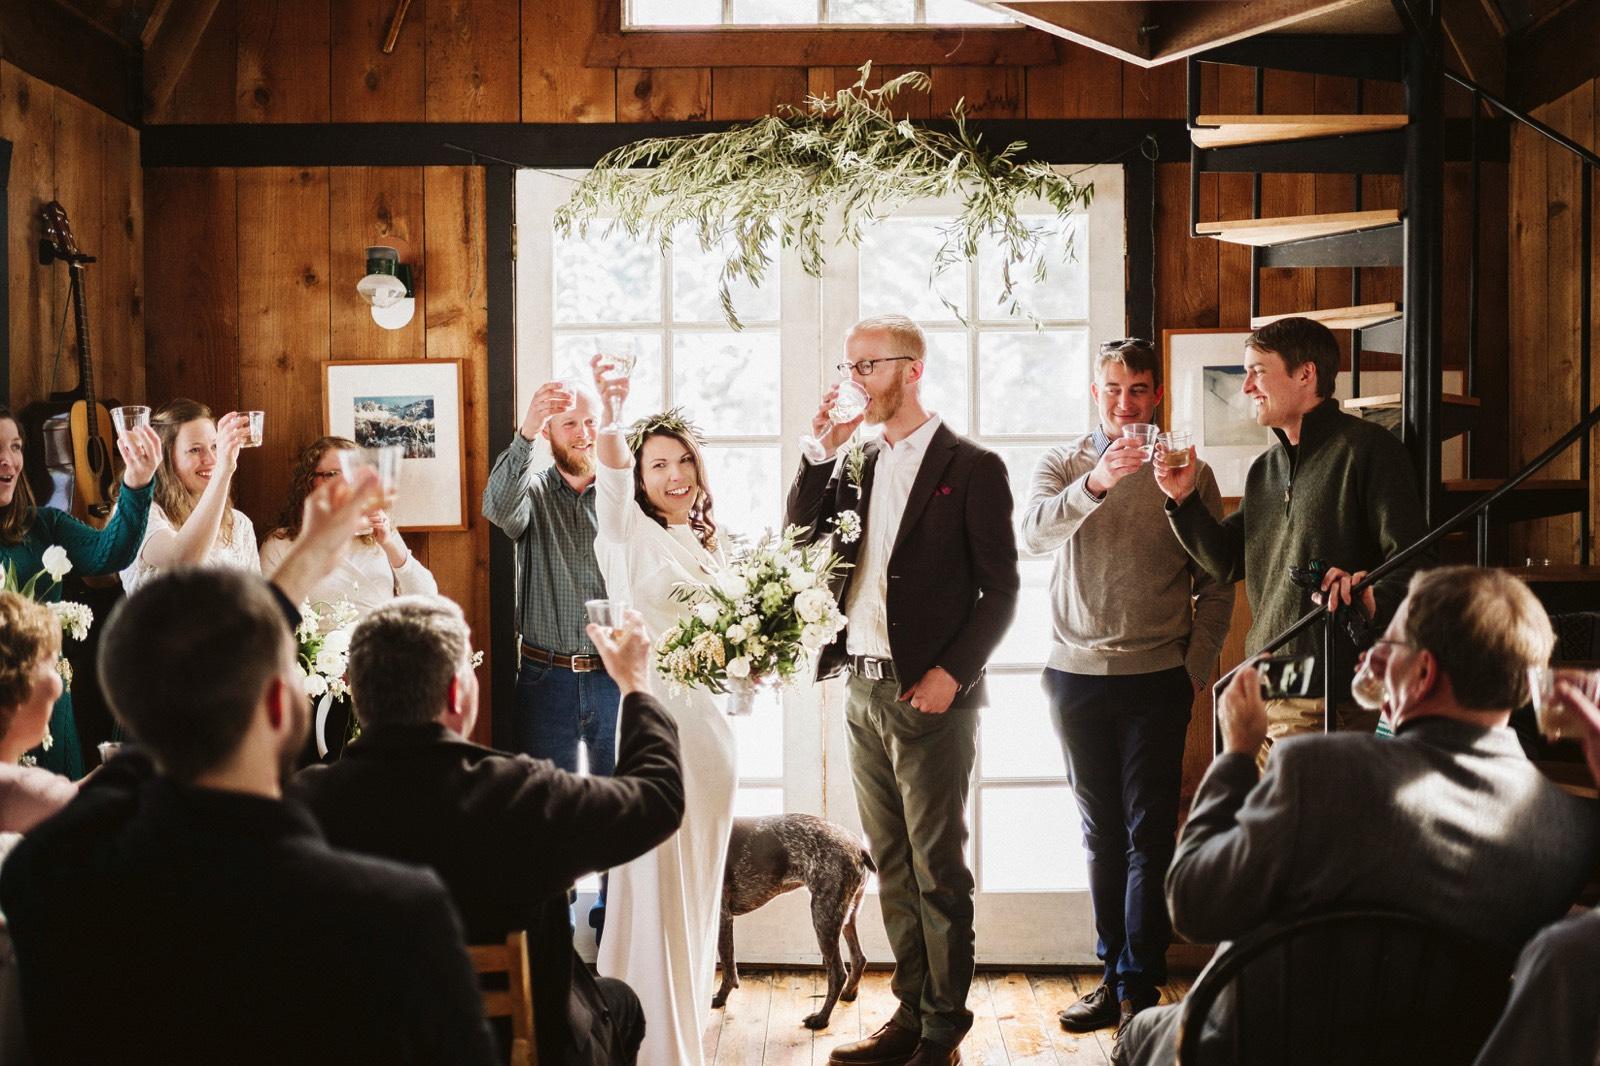 alpine-lakes-high-camp-winter-wedding-42 ALPINE LAKES HIGH CAMP WEDDING